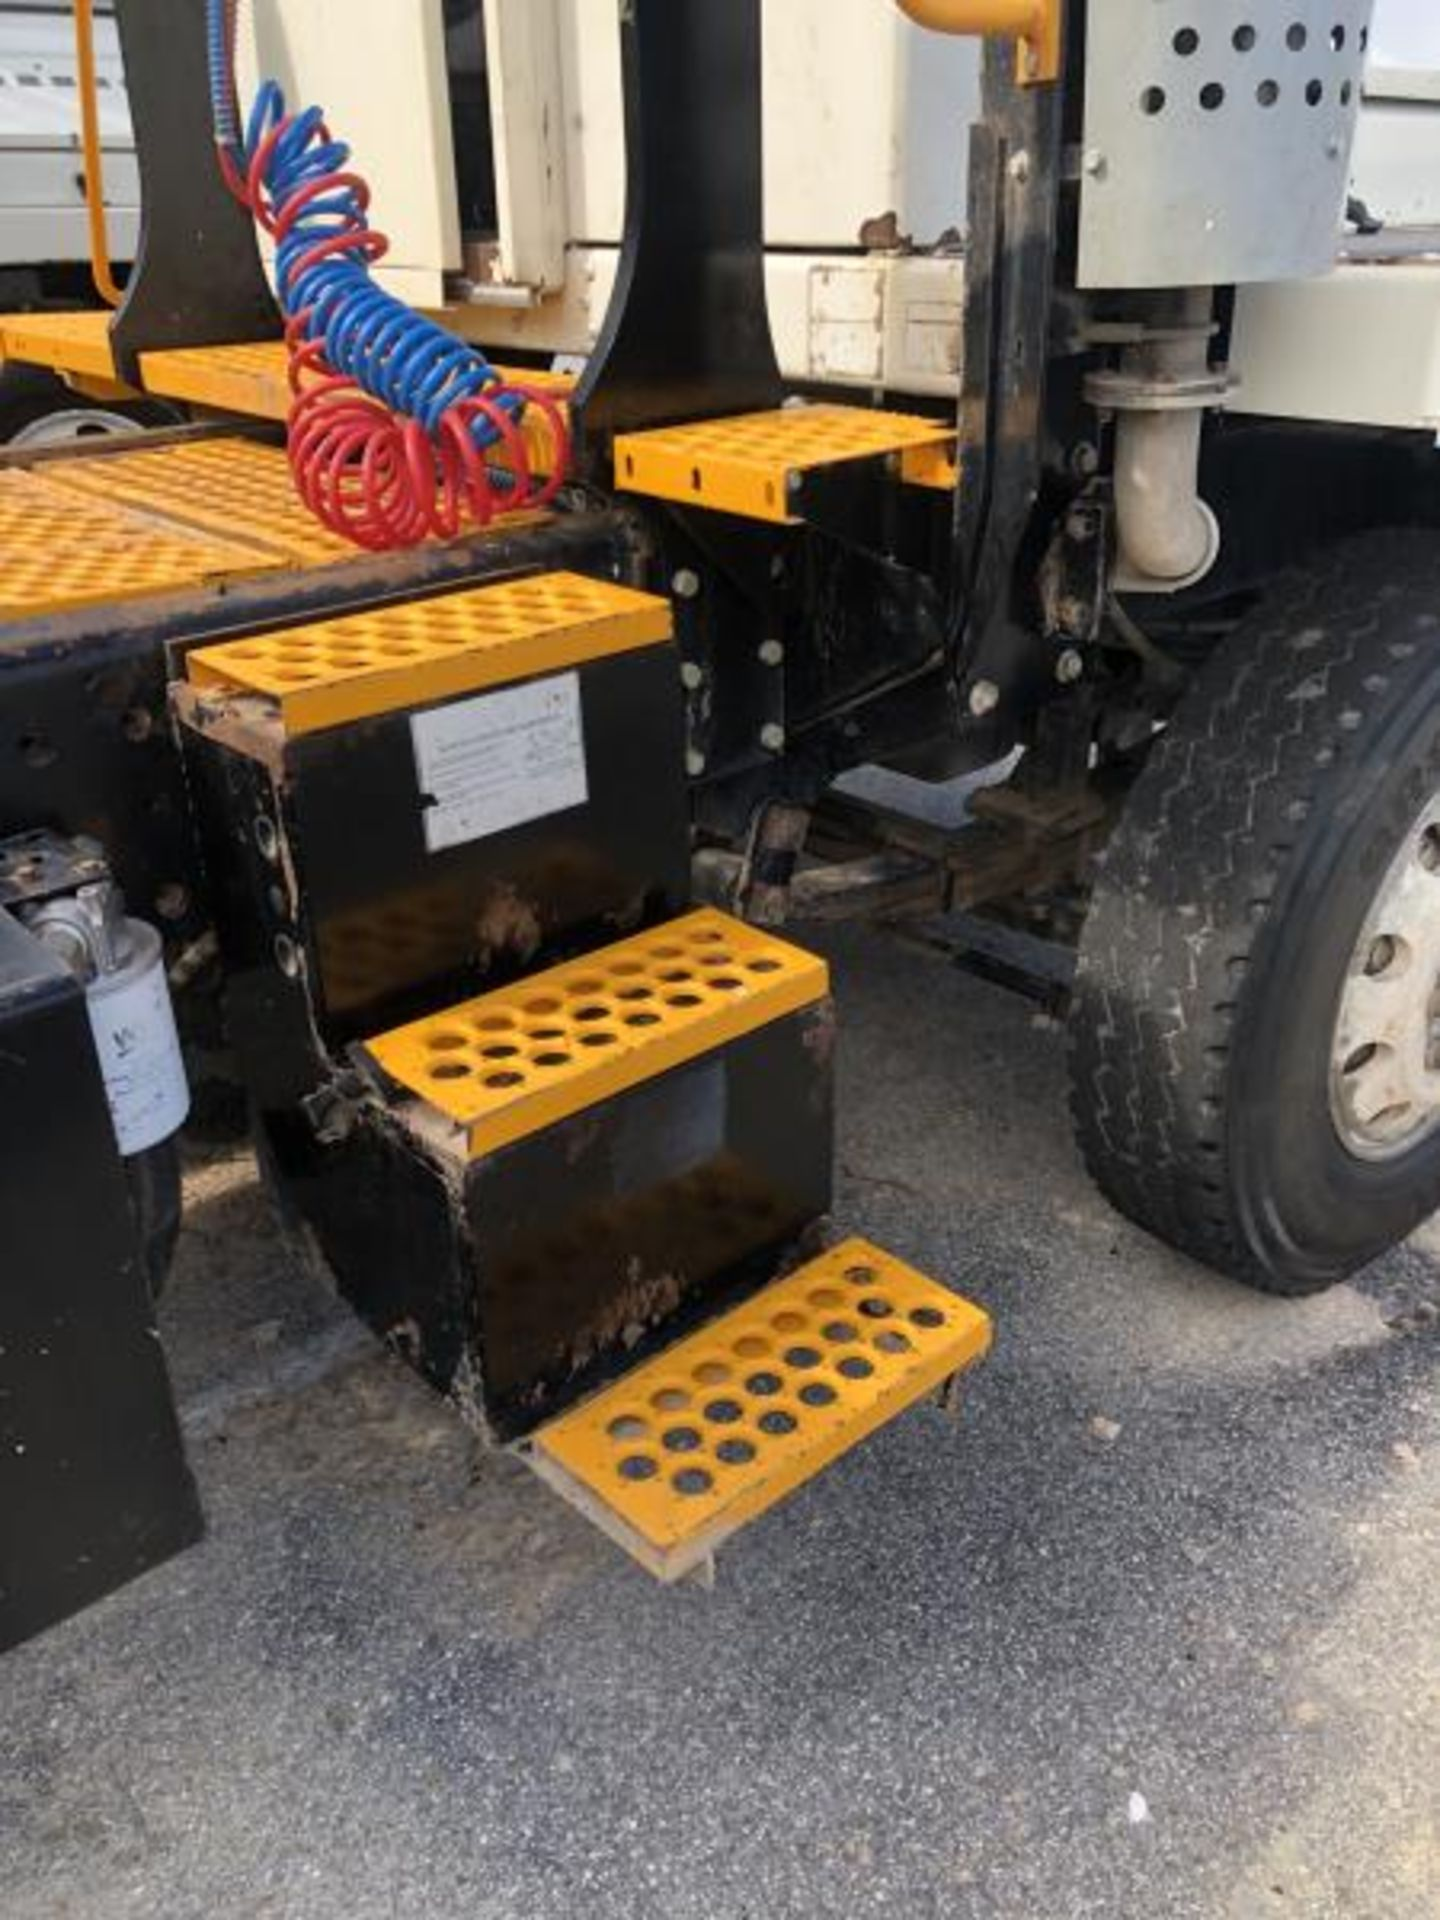 2015 Kalmar Ottawa 4x2 Yard Truck , SN: 338841 4,267.2 Hours, 1,683 Miles - Image 15 of 34